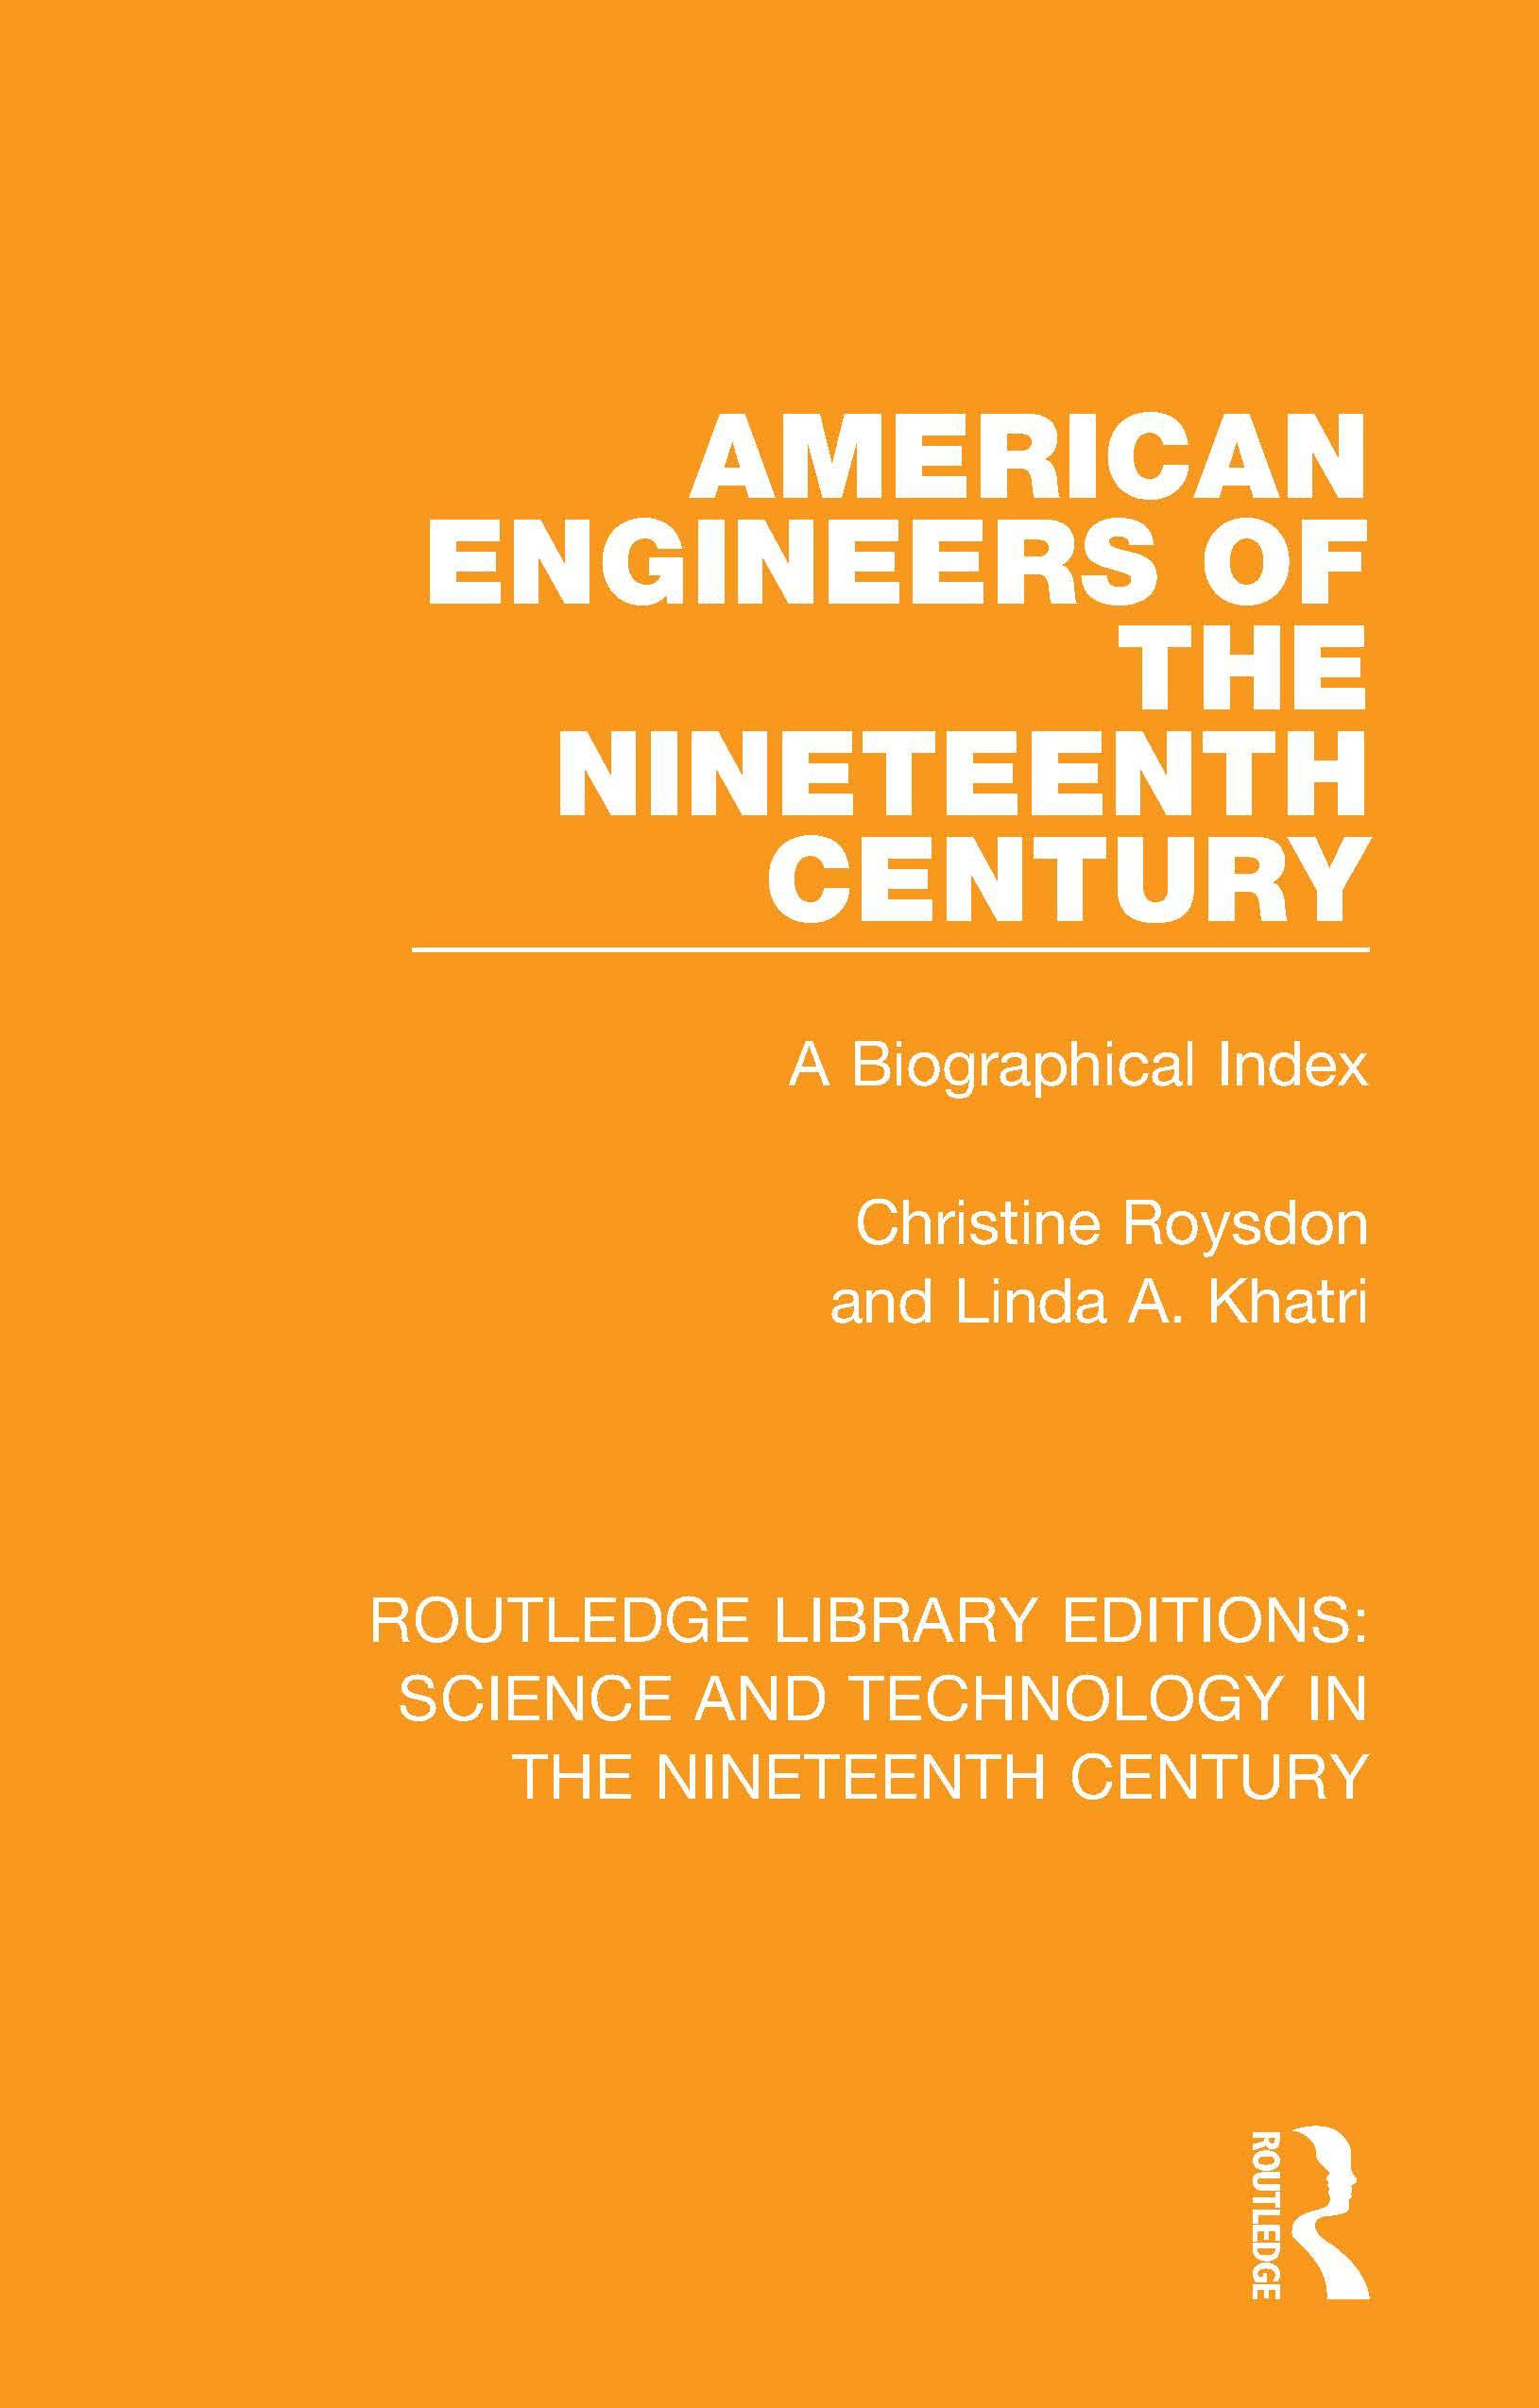 American Engineers of the Nineteenth Century